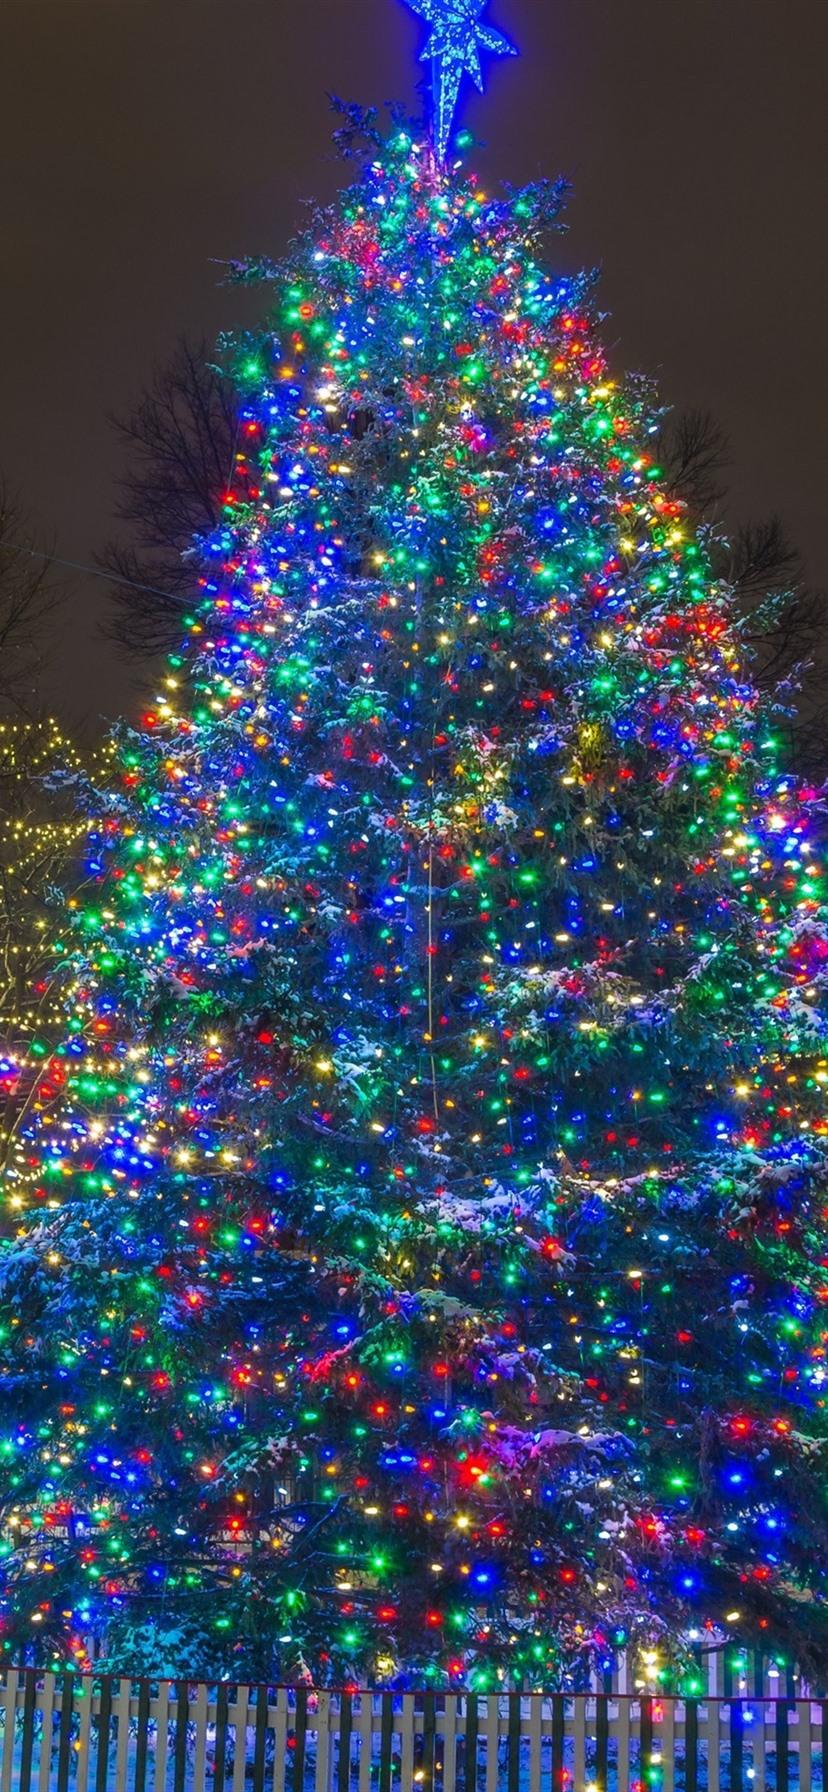 New Year Christmas tree lights night winter snow